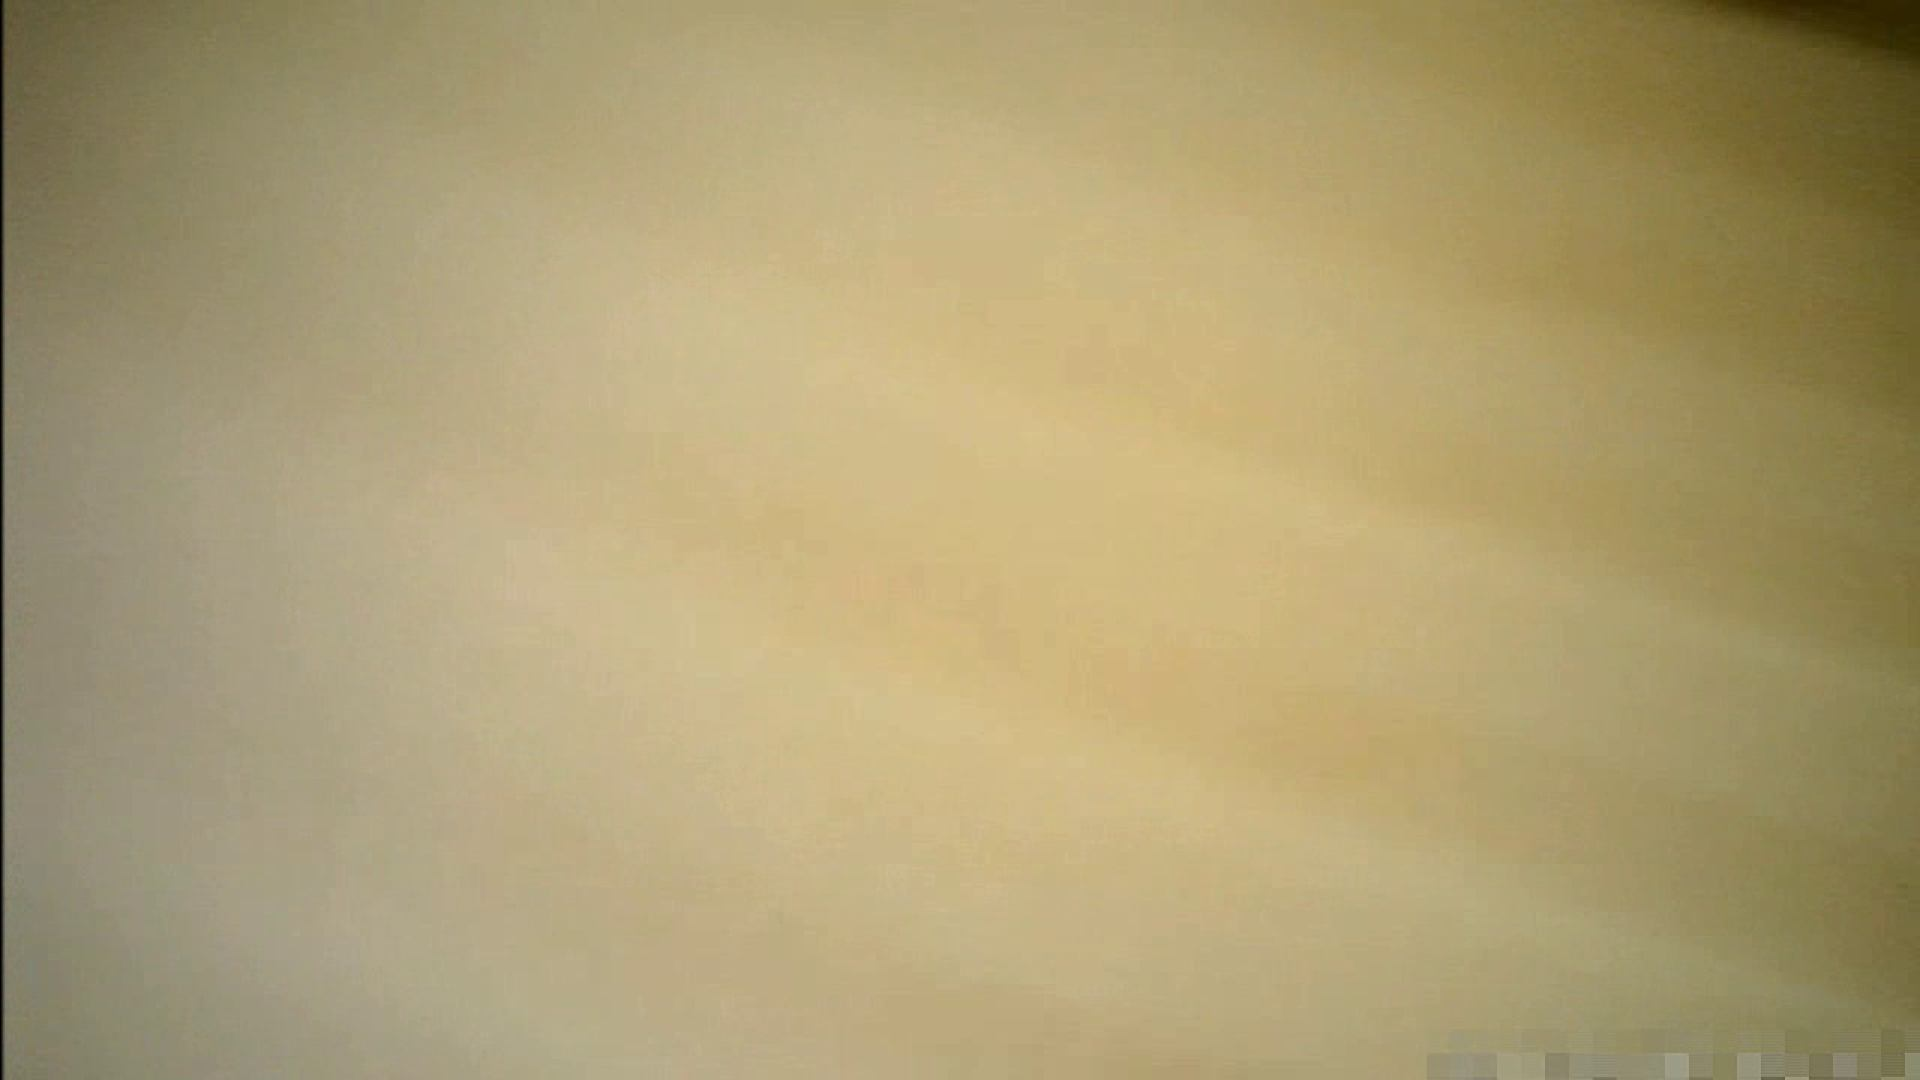 vol.7 【Mちゃん(入浴)】ブランド品査定士19歳 巨乳ギャル 巨乳 エロ無料画像 62画像 11